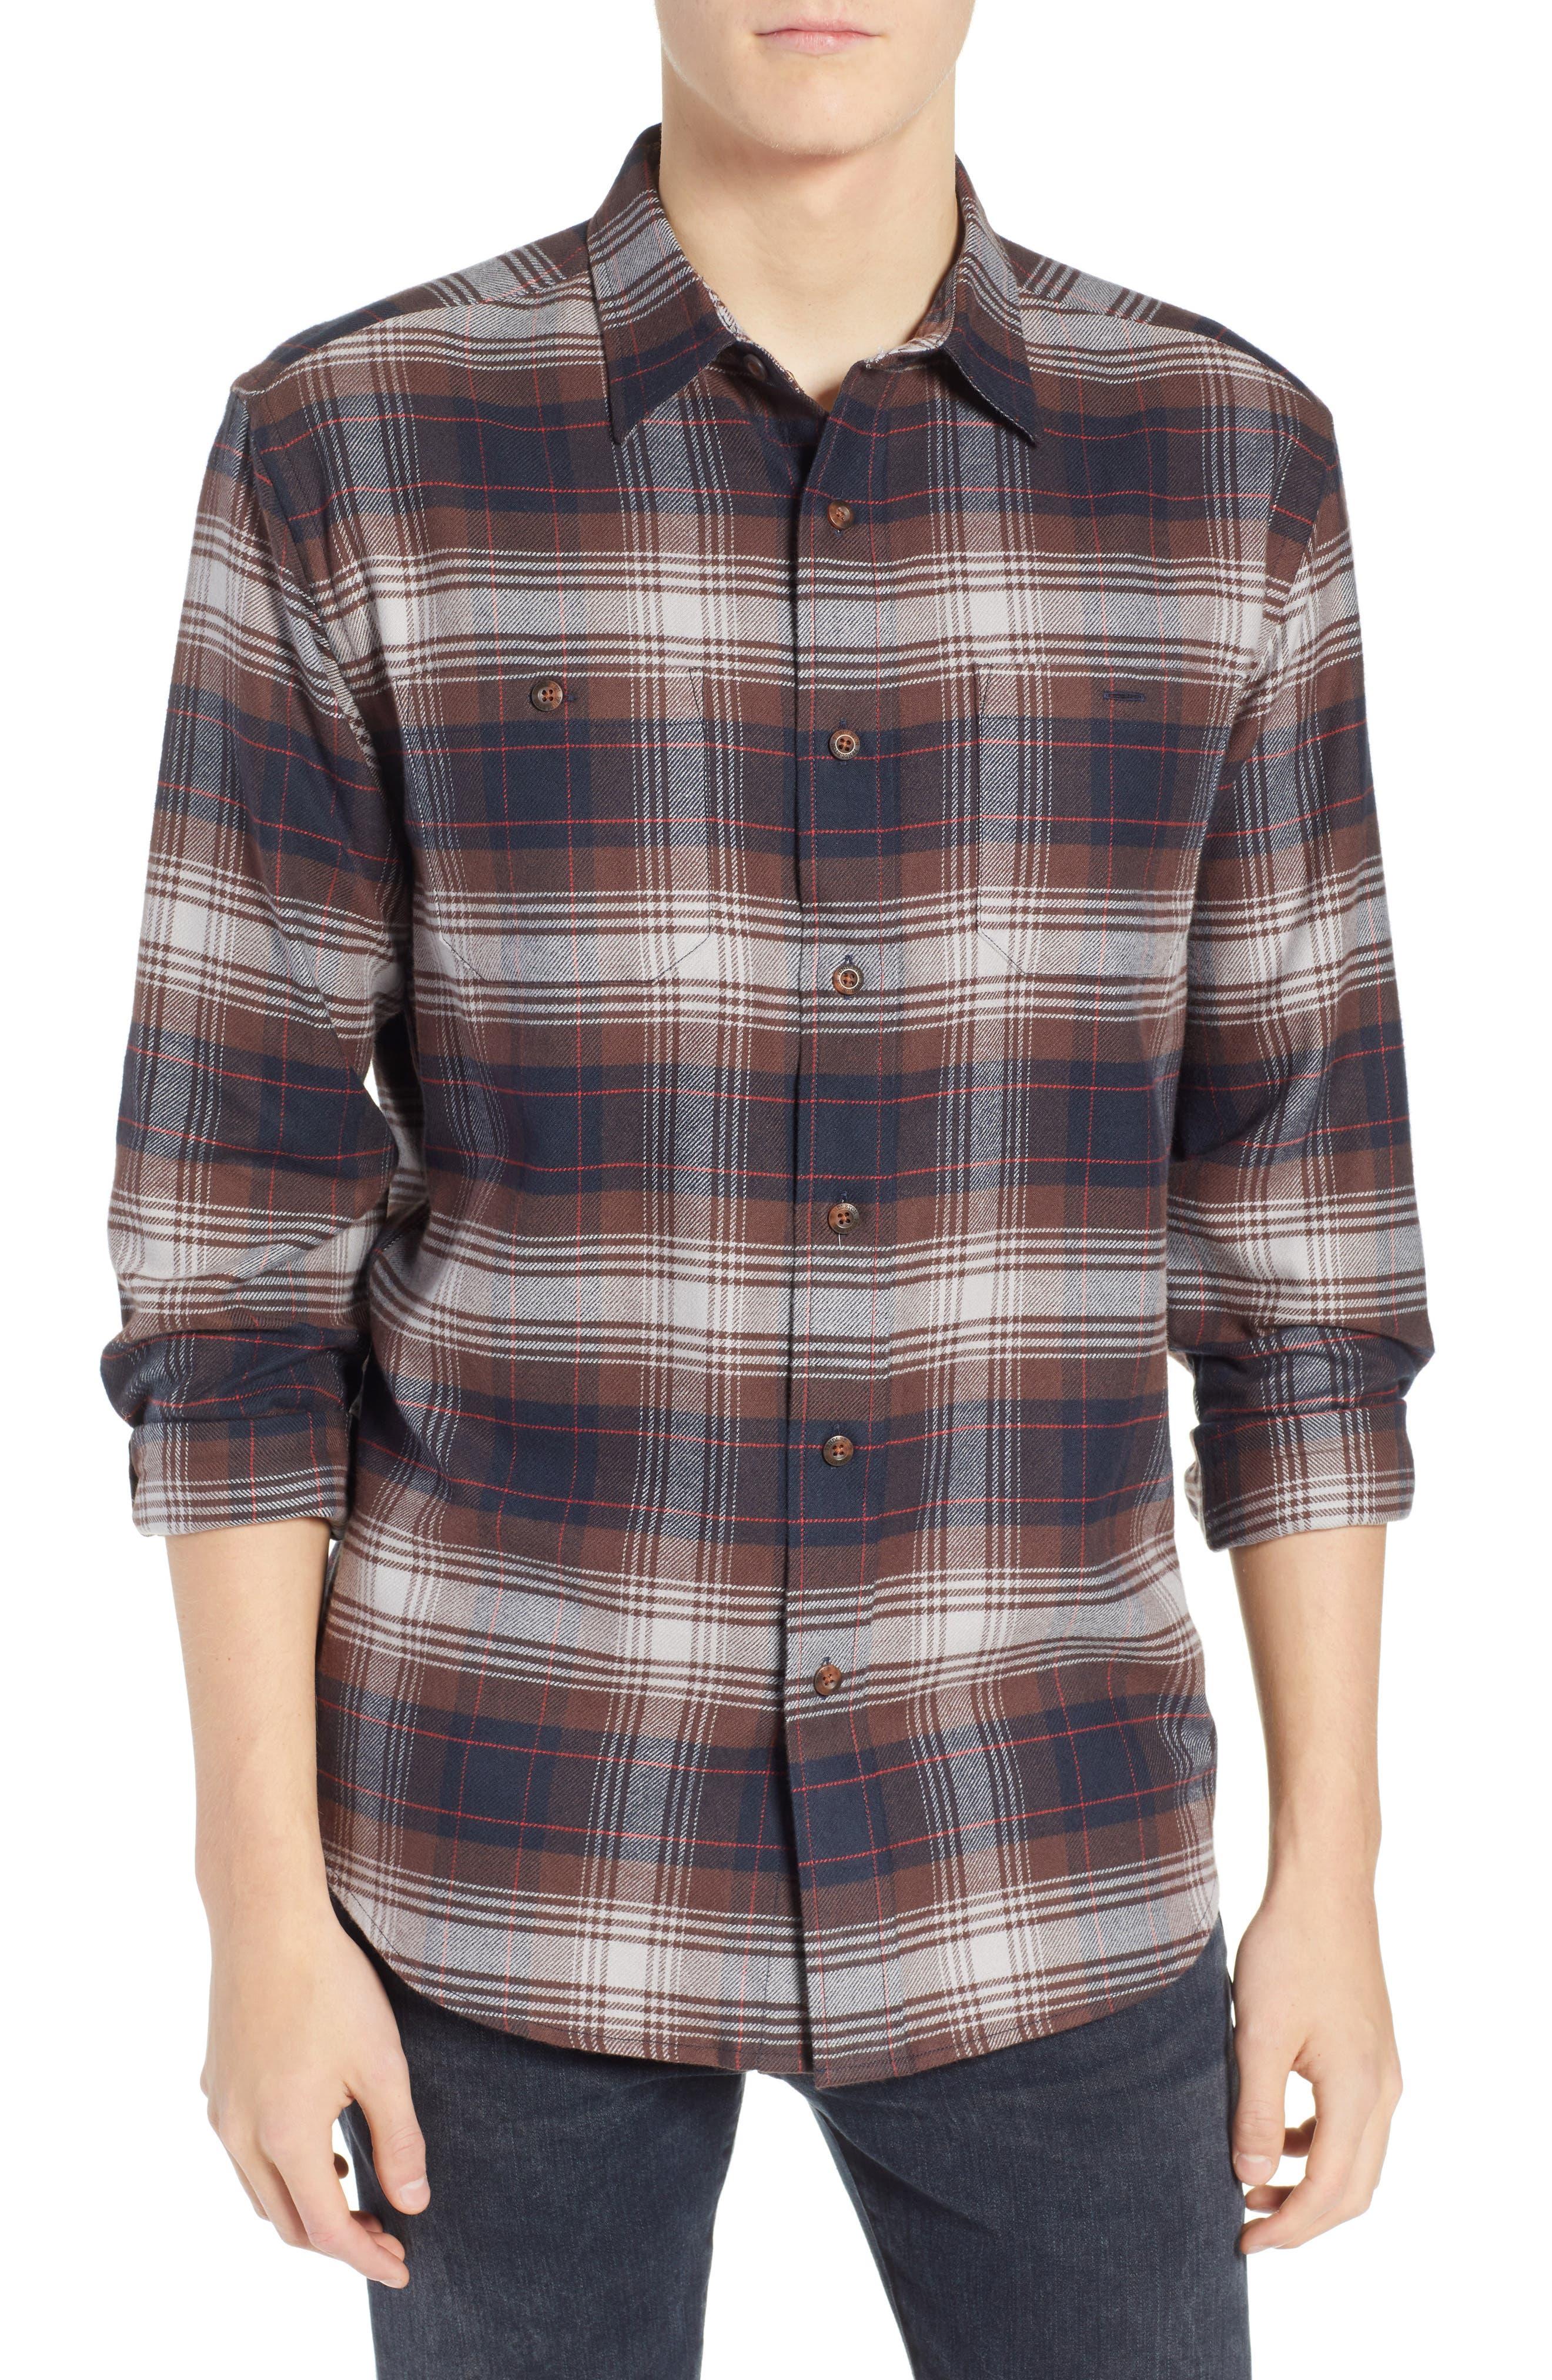 PENDLETON Hawthorne Plaid Flannel Shirt in Lunar Tartan